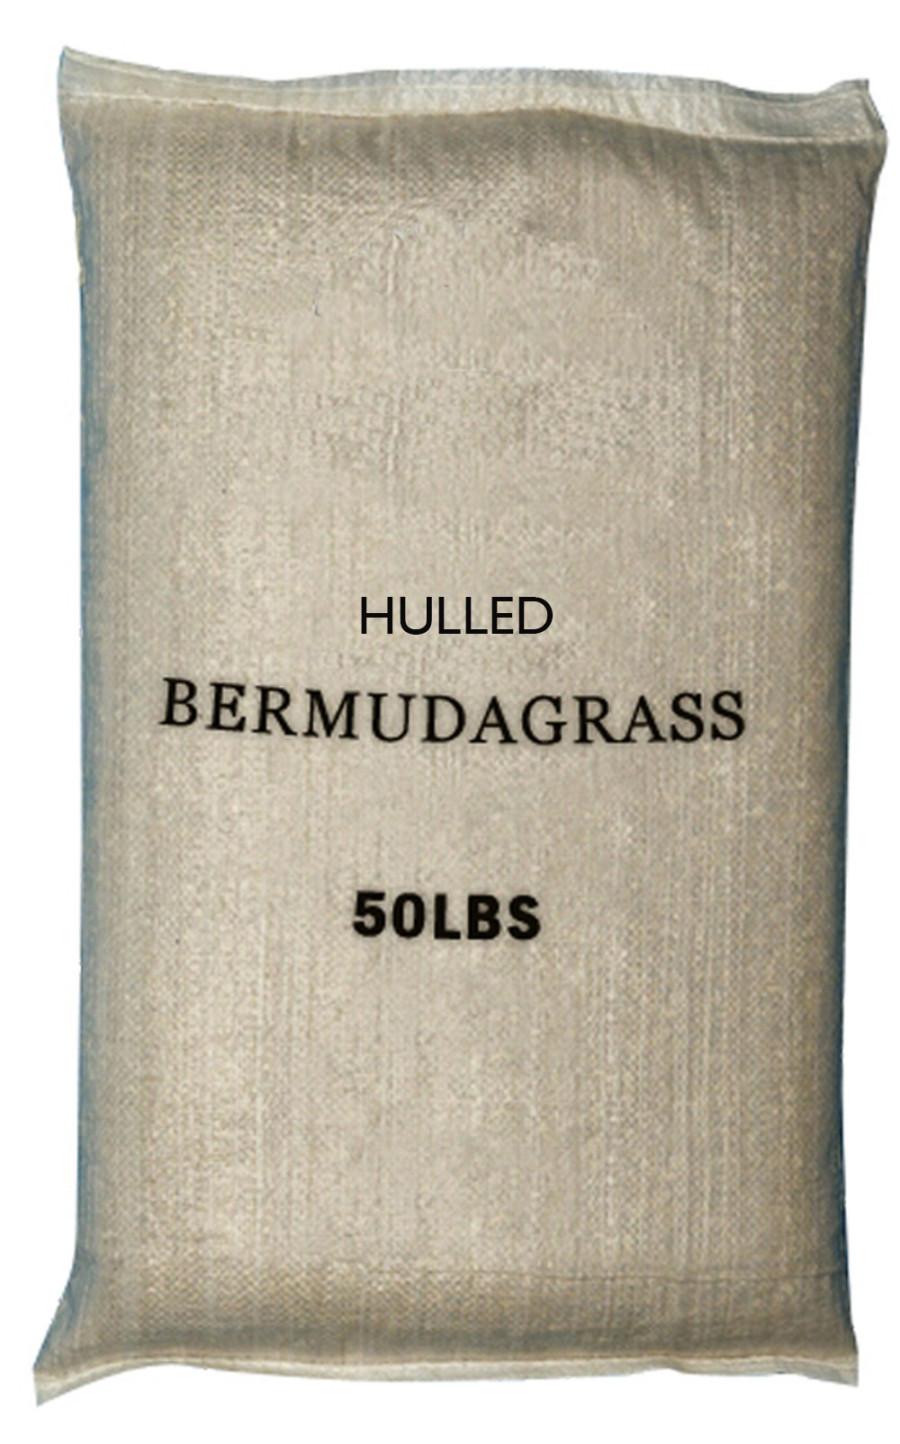 Pennington Bermudagrass Hulled 95/85 Blend 1ea/50 lb